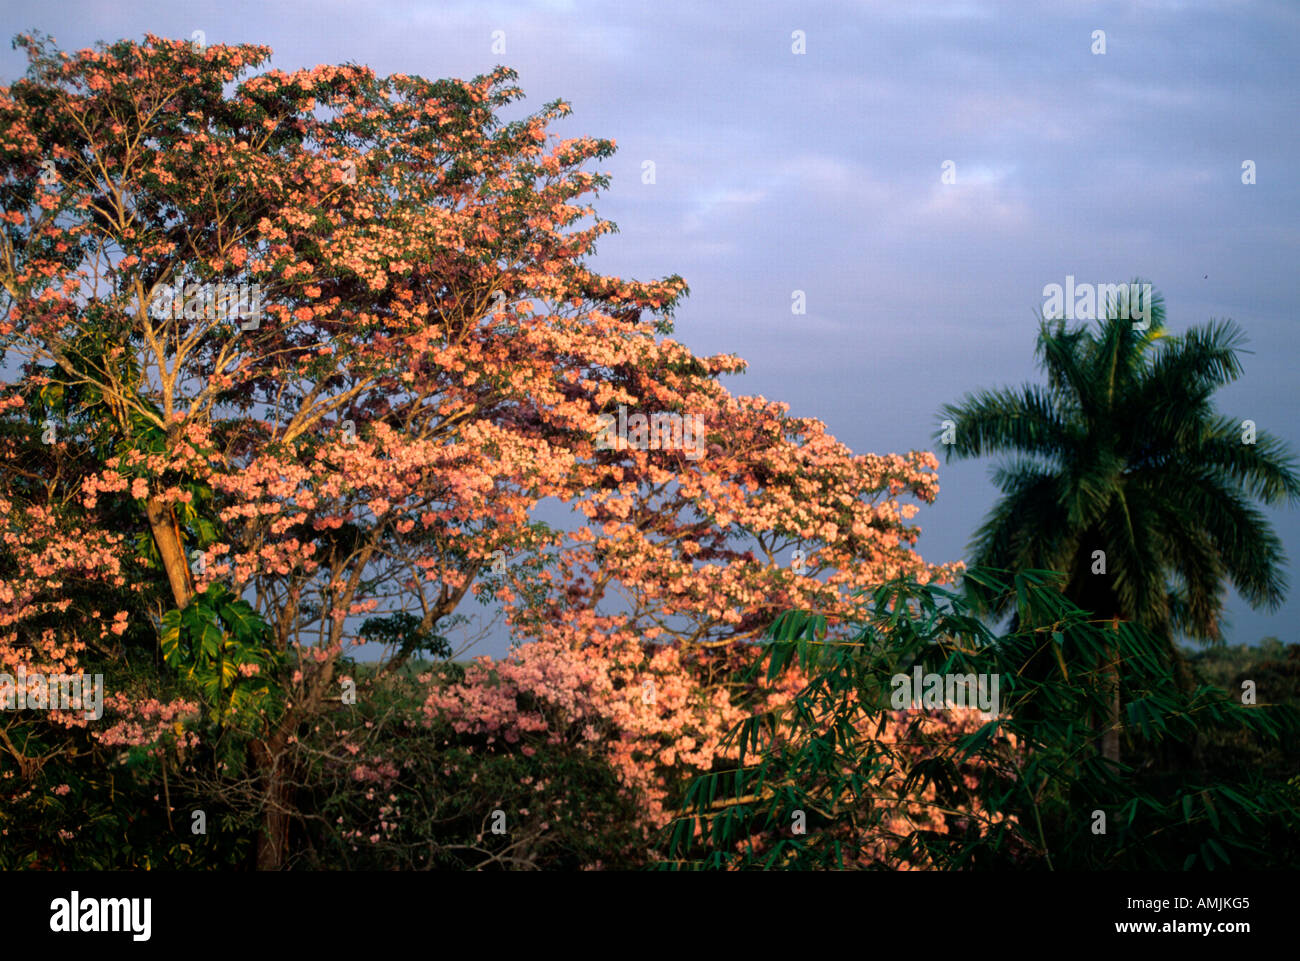 Mexiko, Yucatan, tropische Vegetation - Stock Image